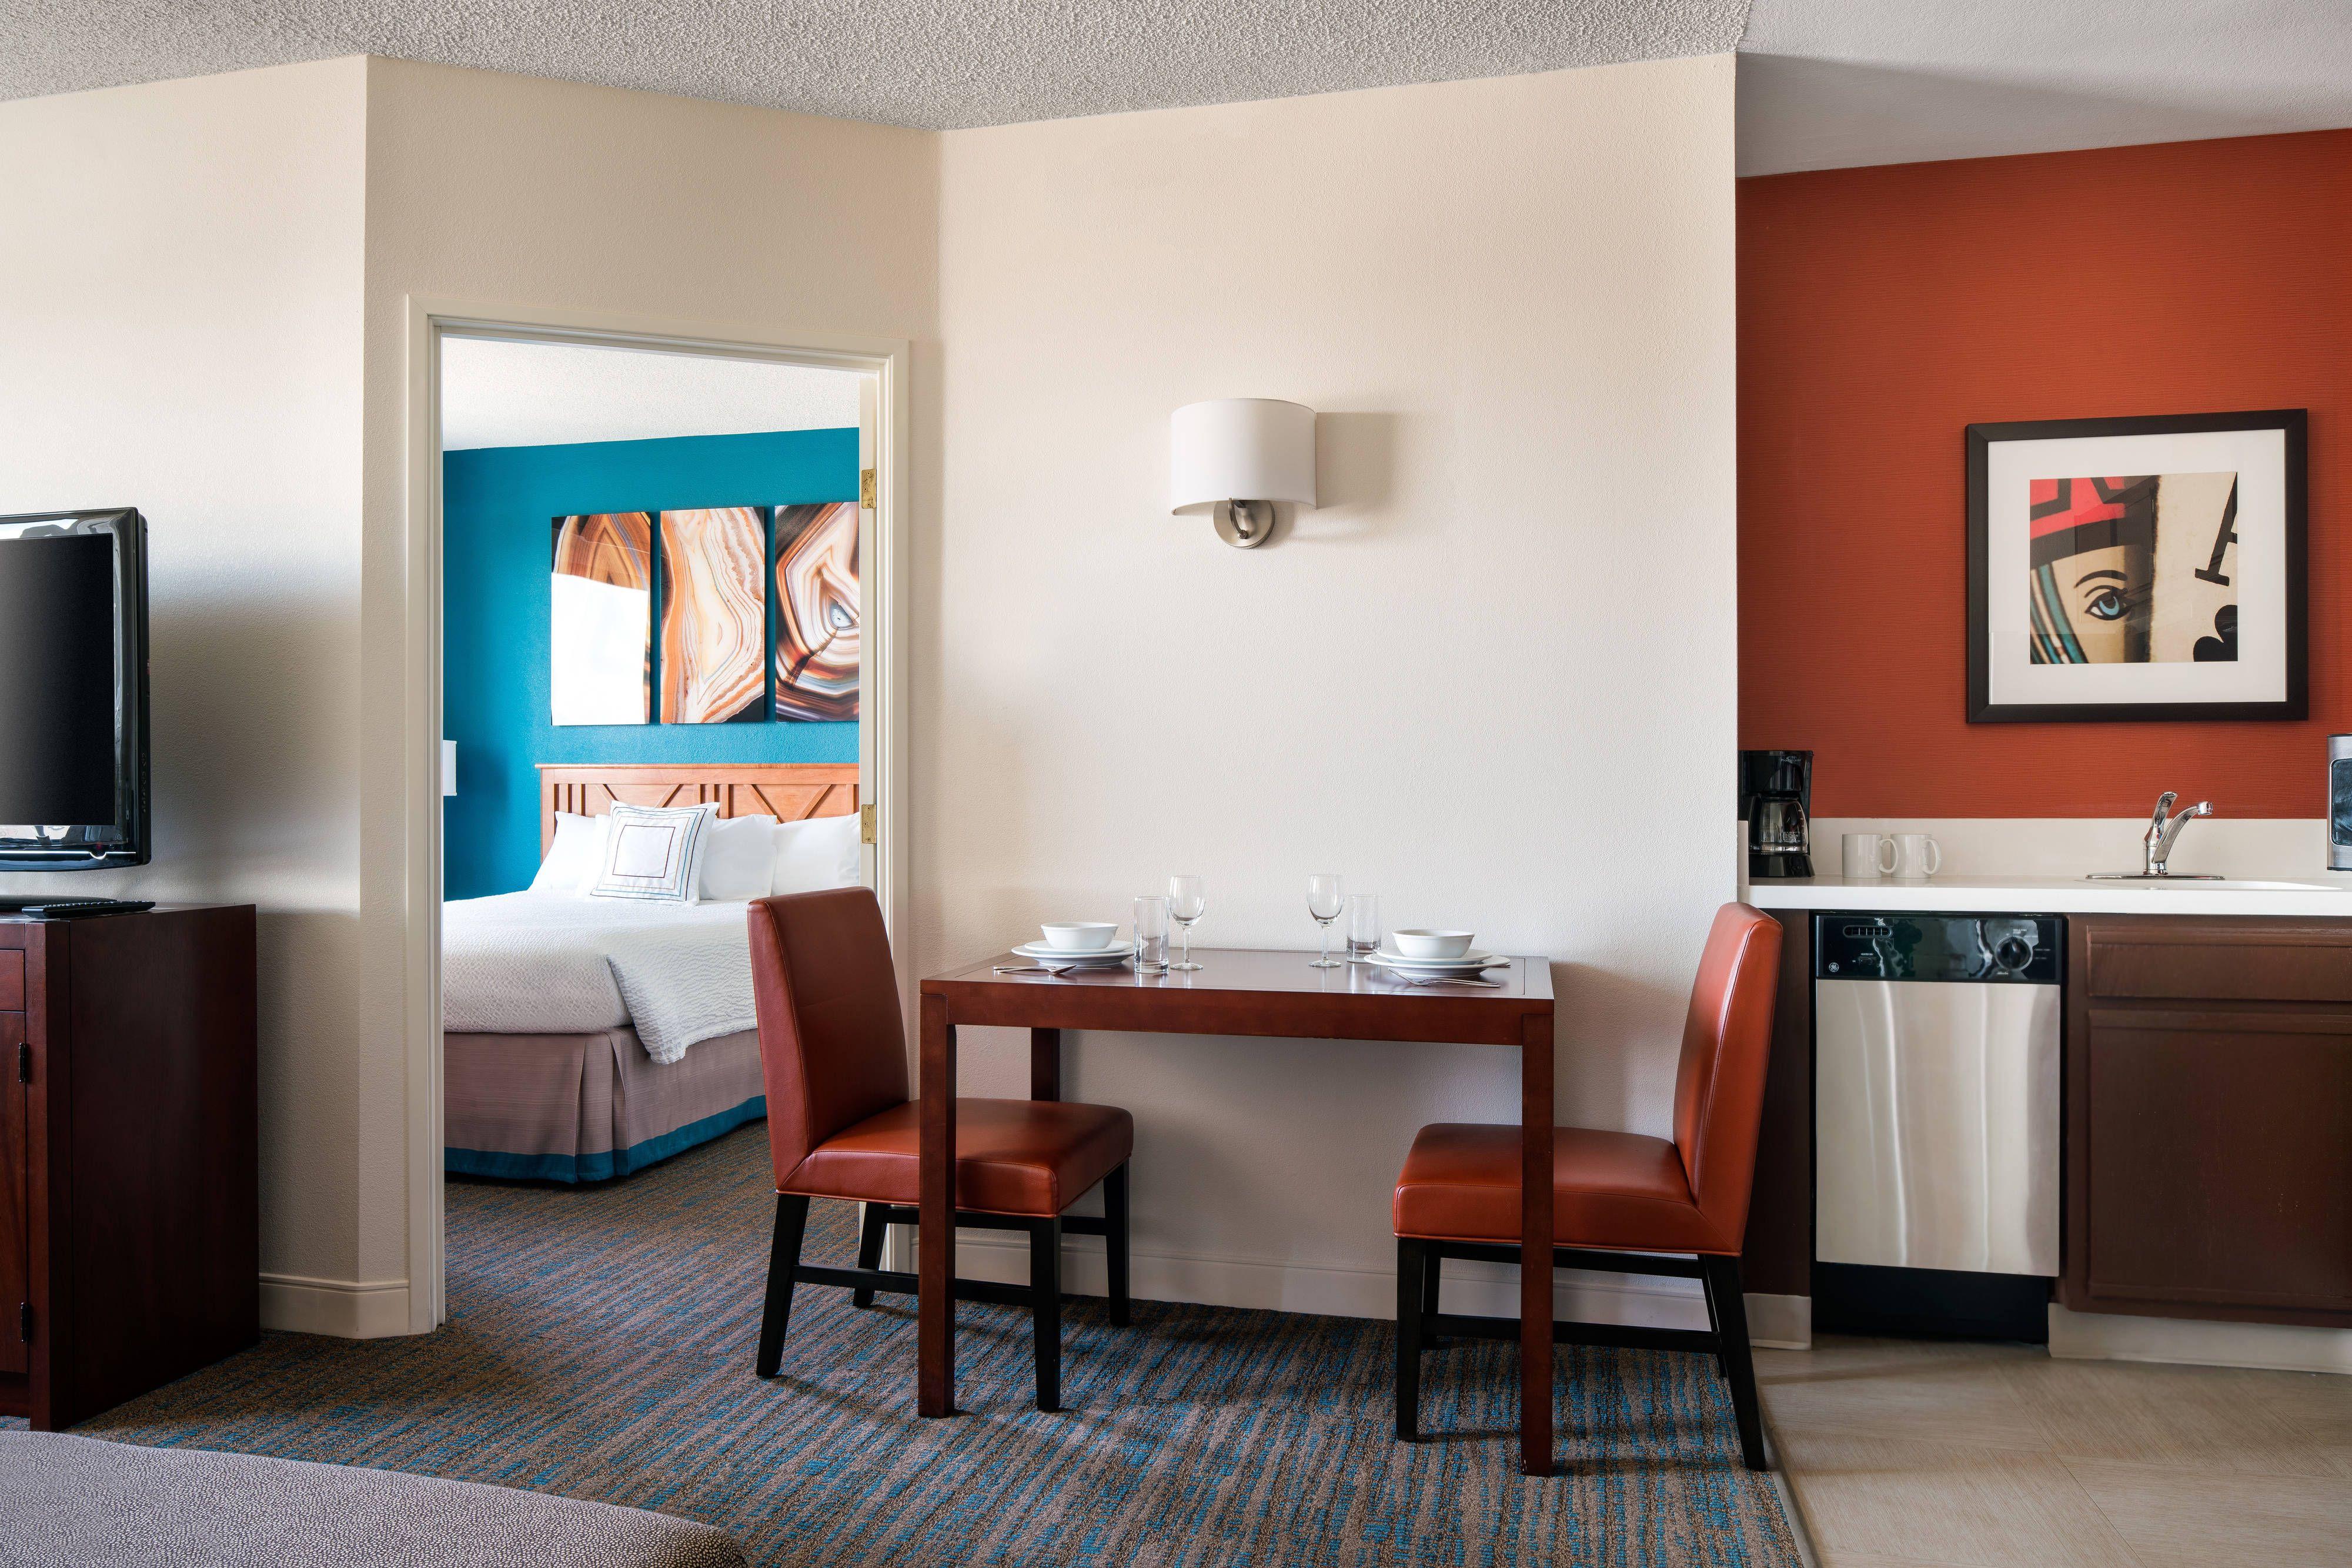 Tower Luxury Suite Living Room. Luxurious bedrooms